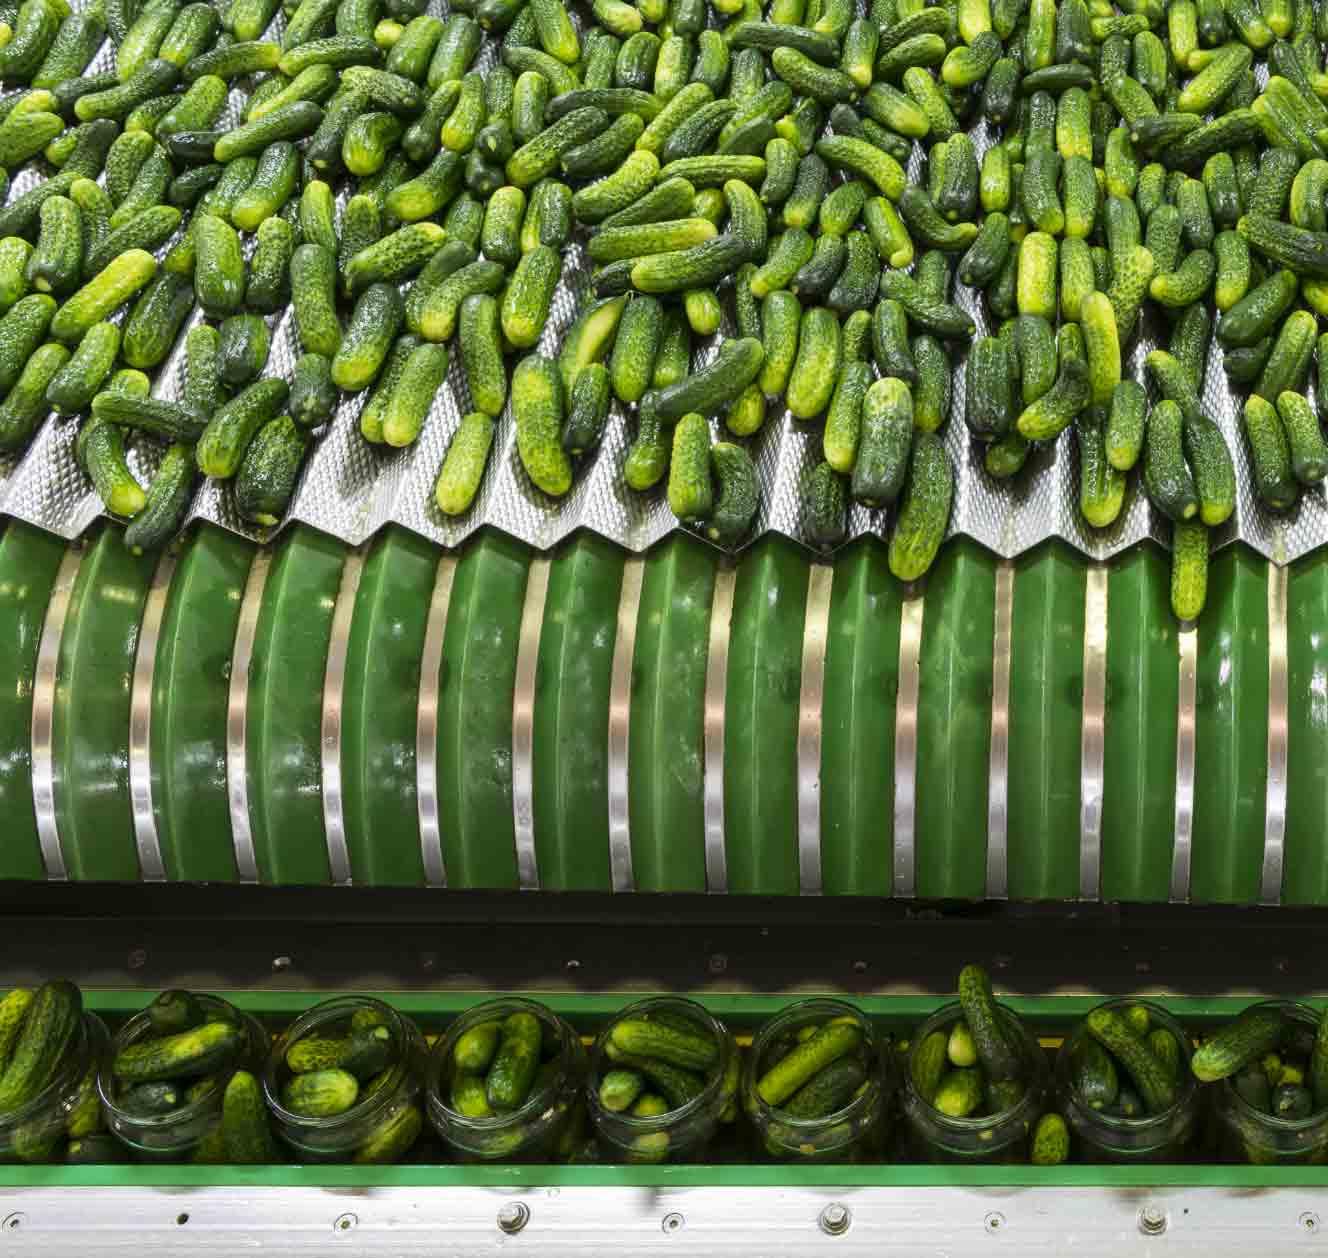 bulk pickles on production line